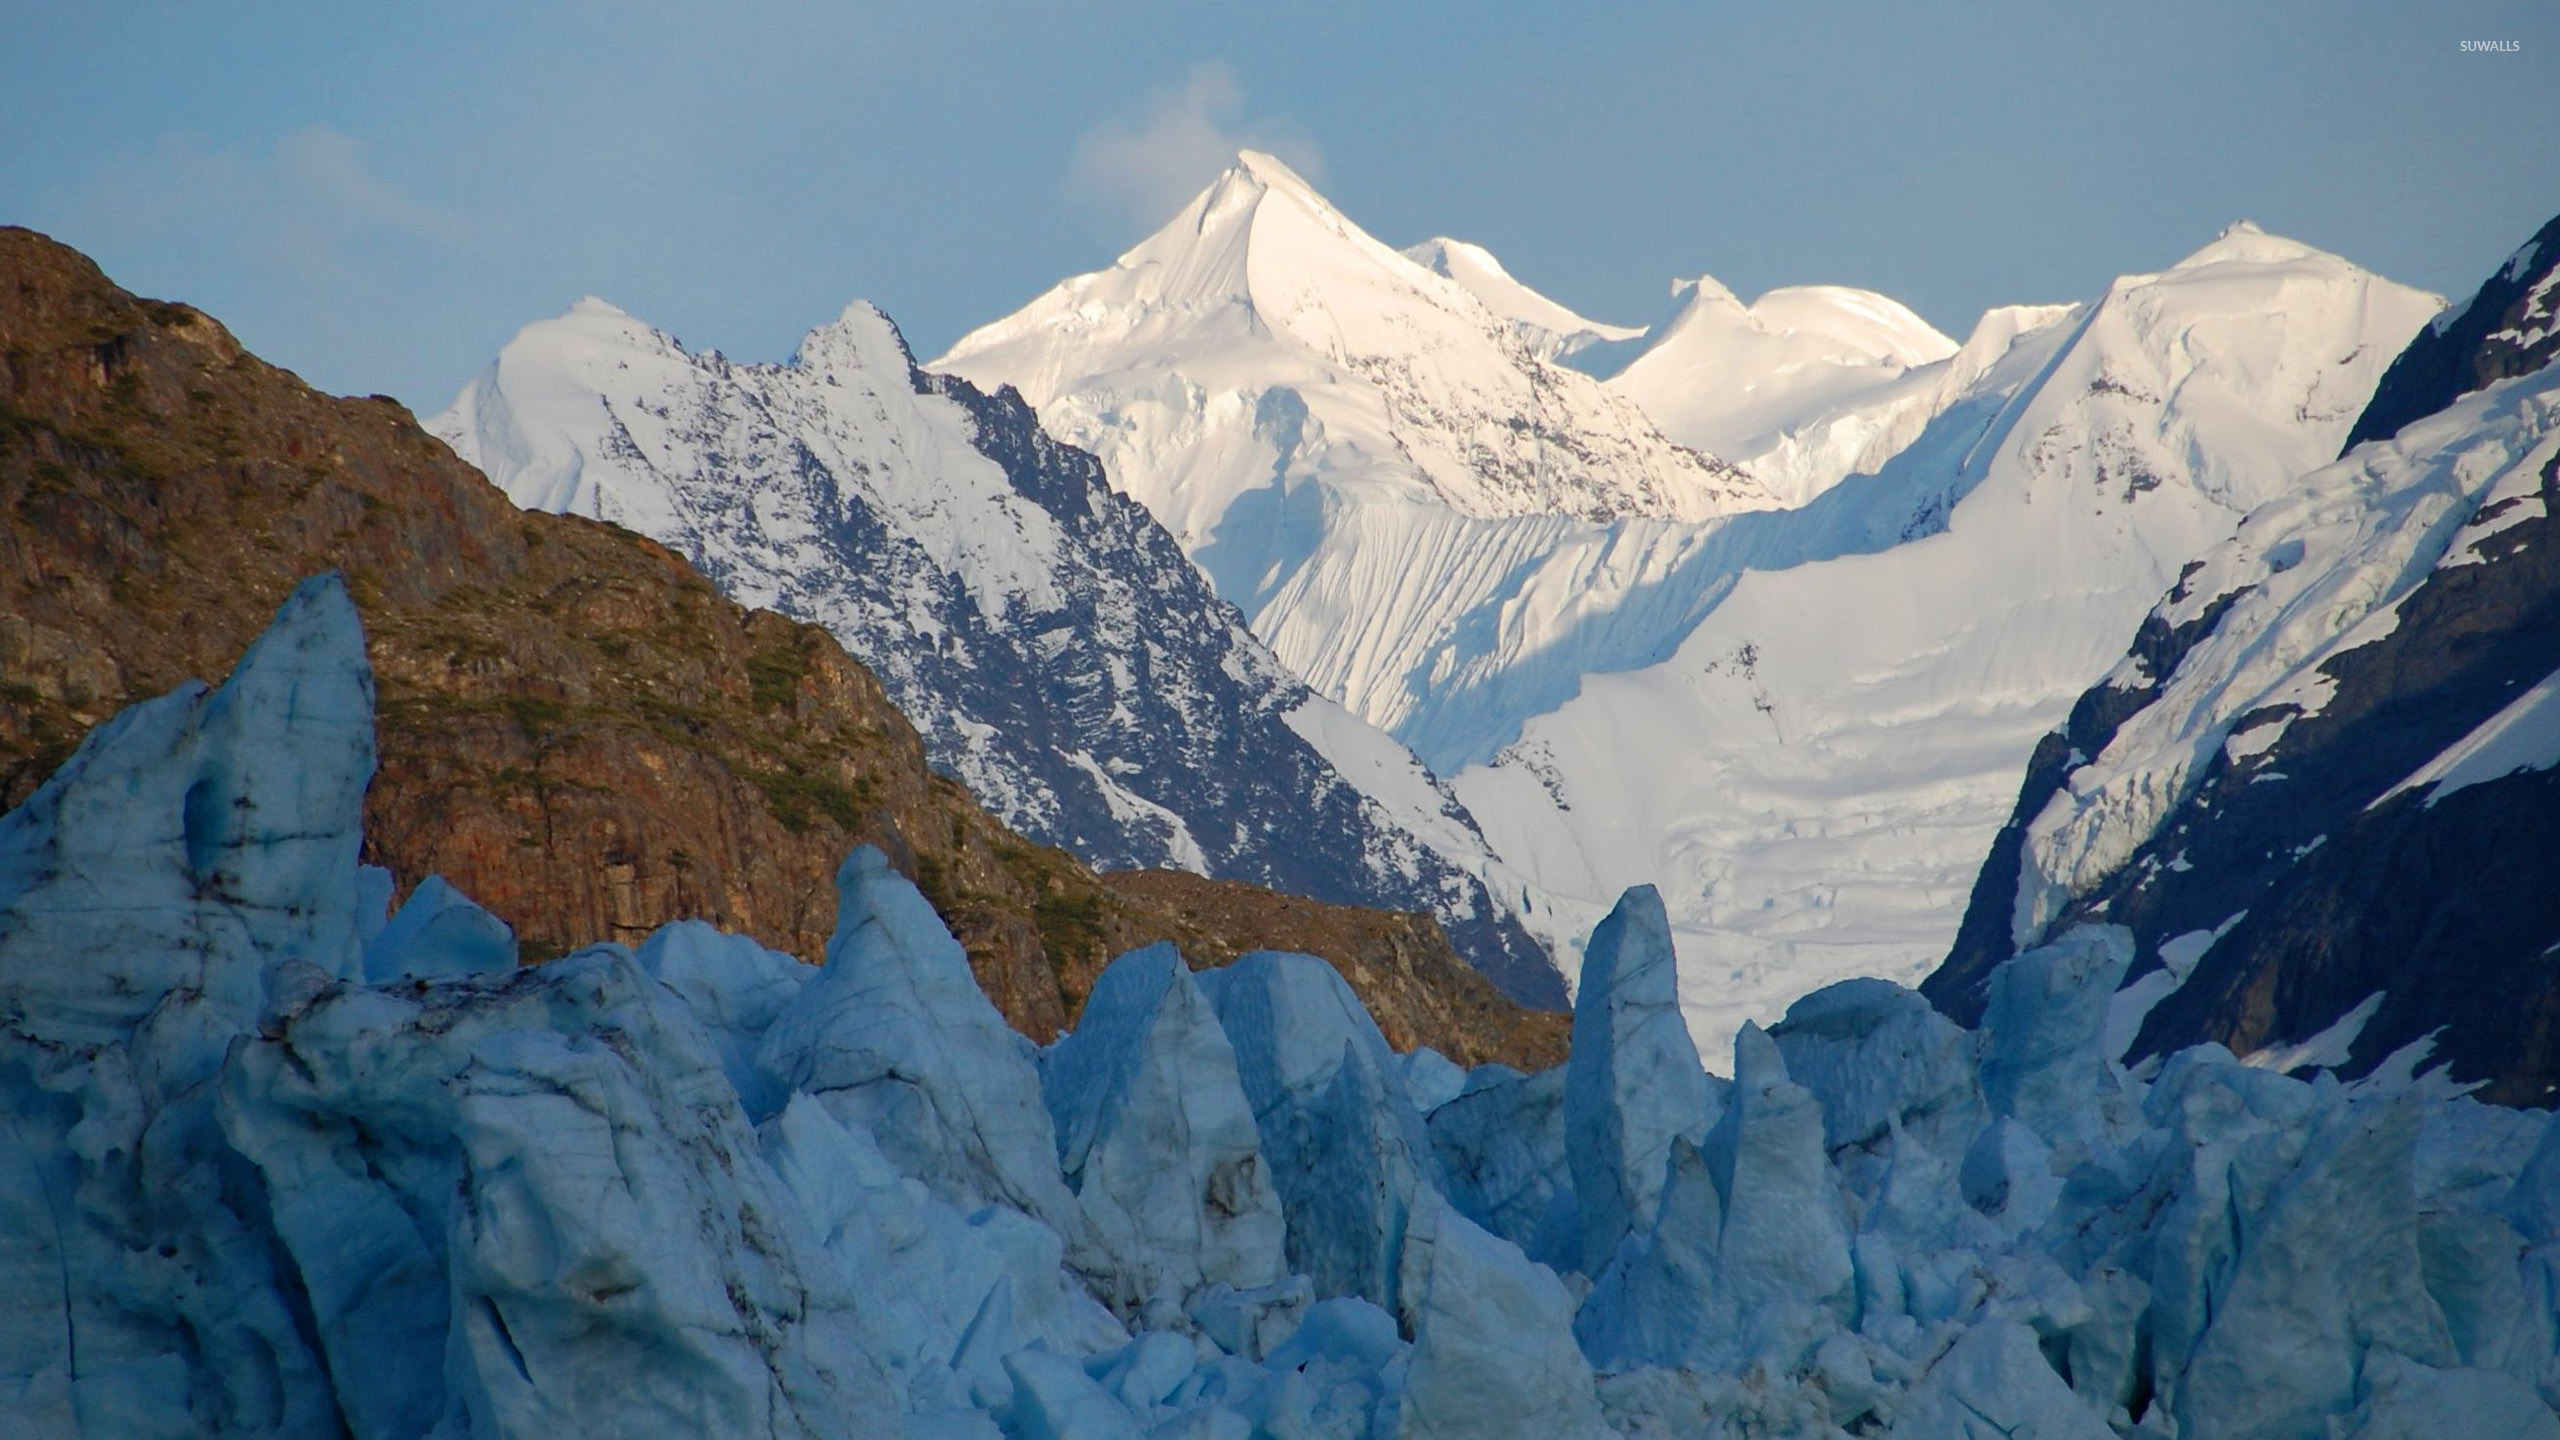 Fall Lake Wallpaper Glacier Bay National Park And Preserve Alaska Wallpaper